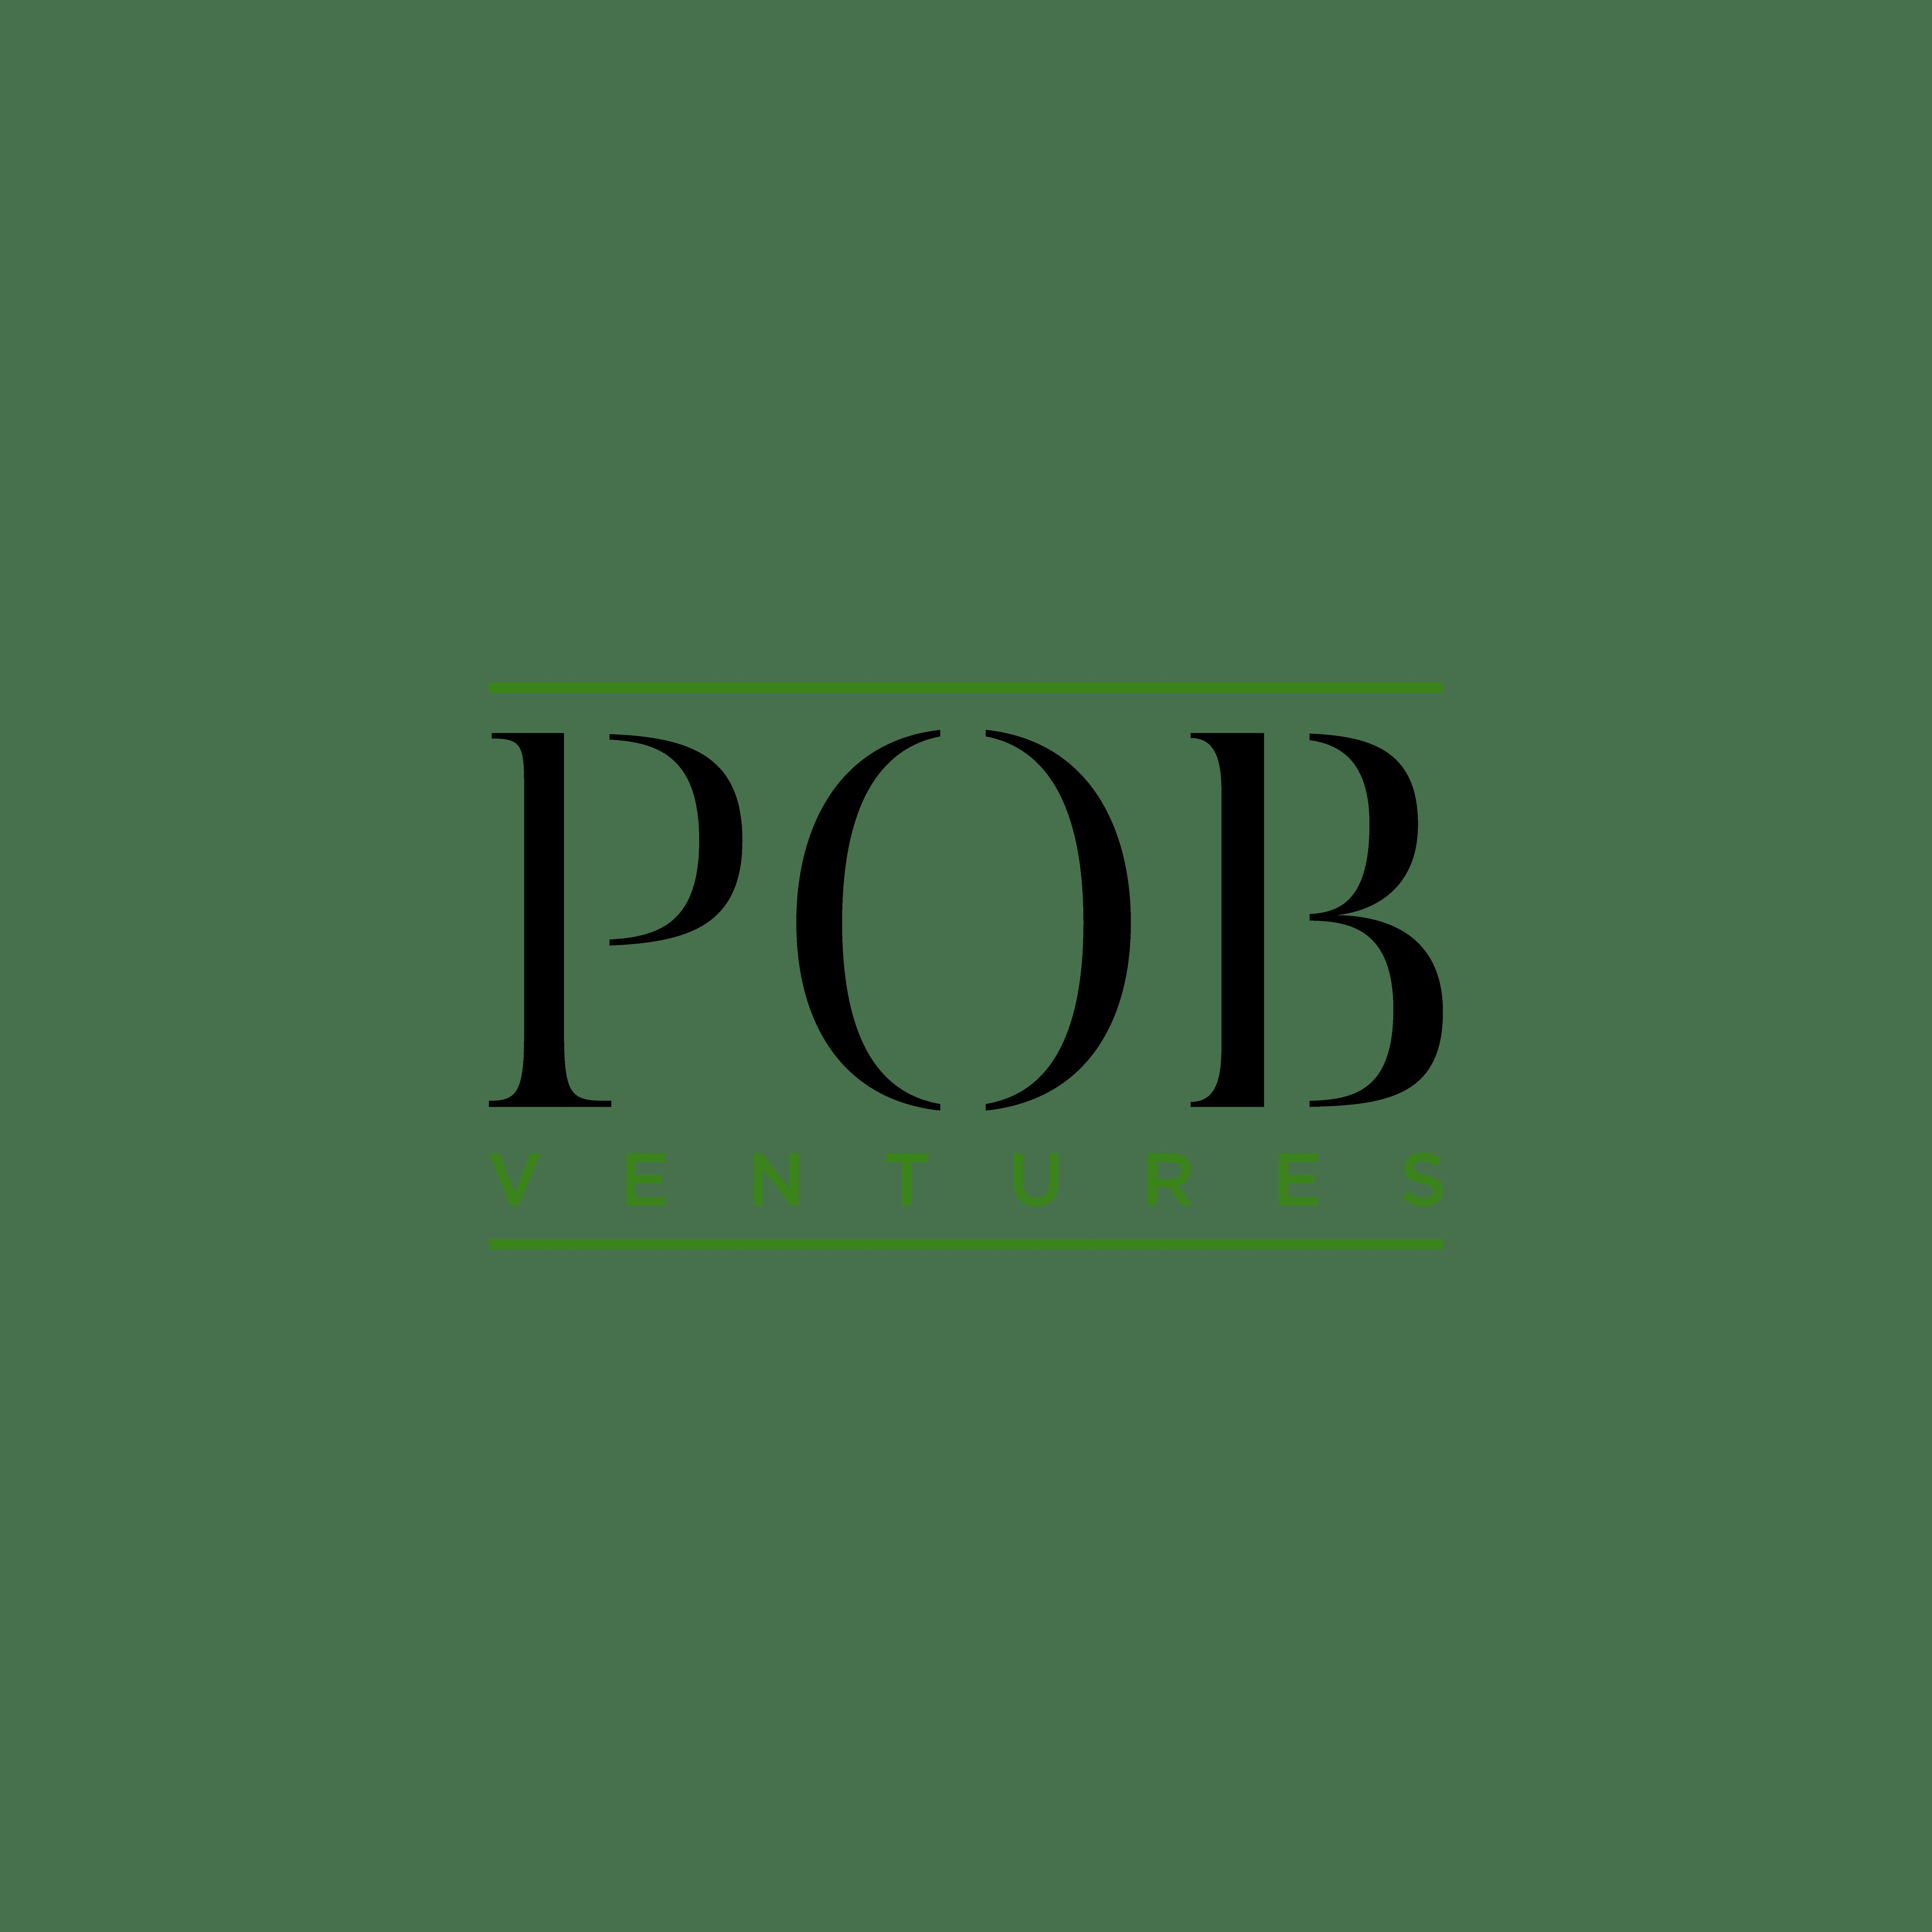 pat-obrien-ventures-logo-2020-COVID19